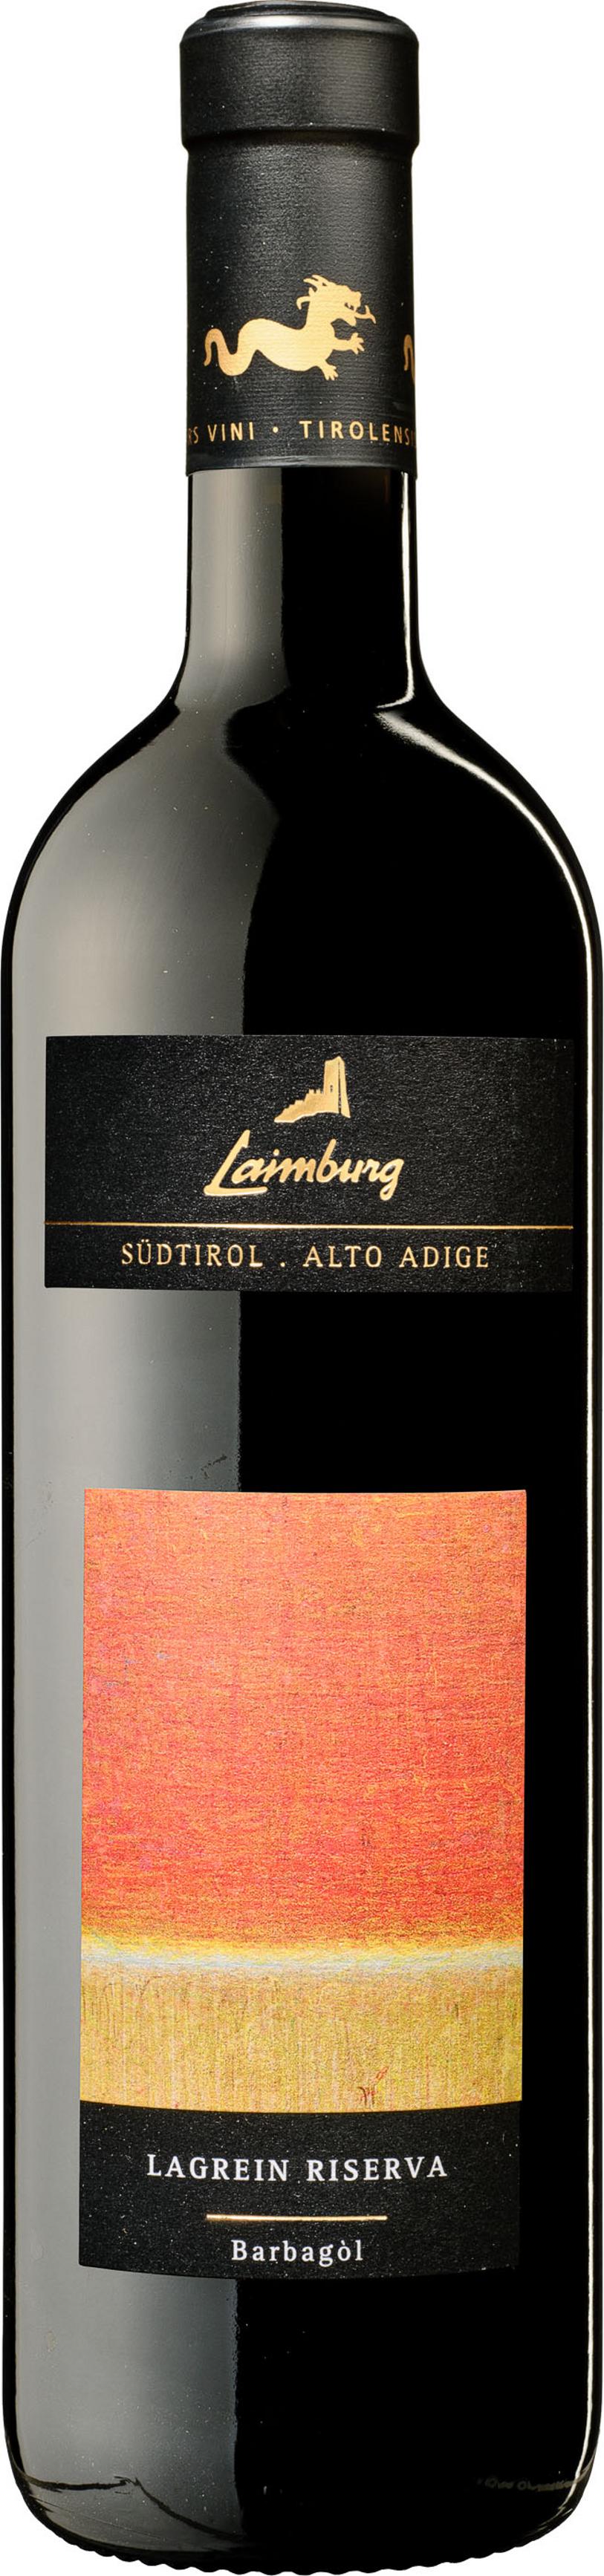 Lagrein-Riserva-Barbagol-2010-Cantina-Laimburg